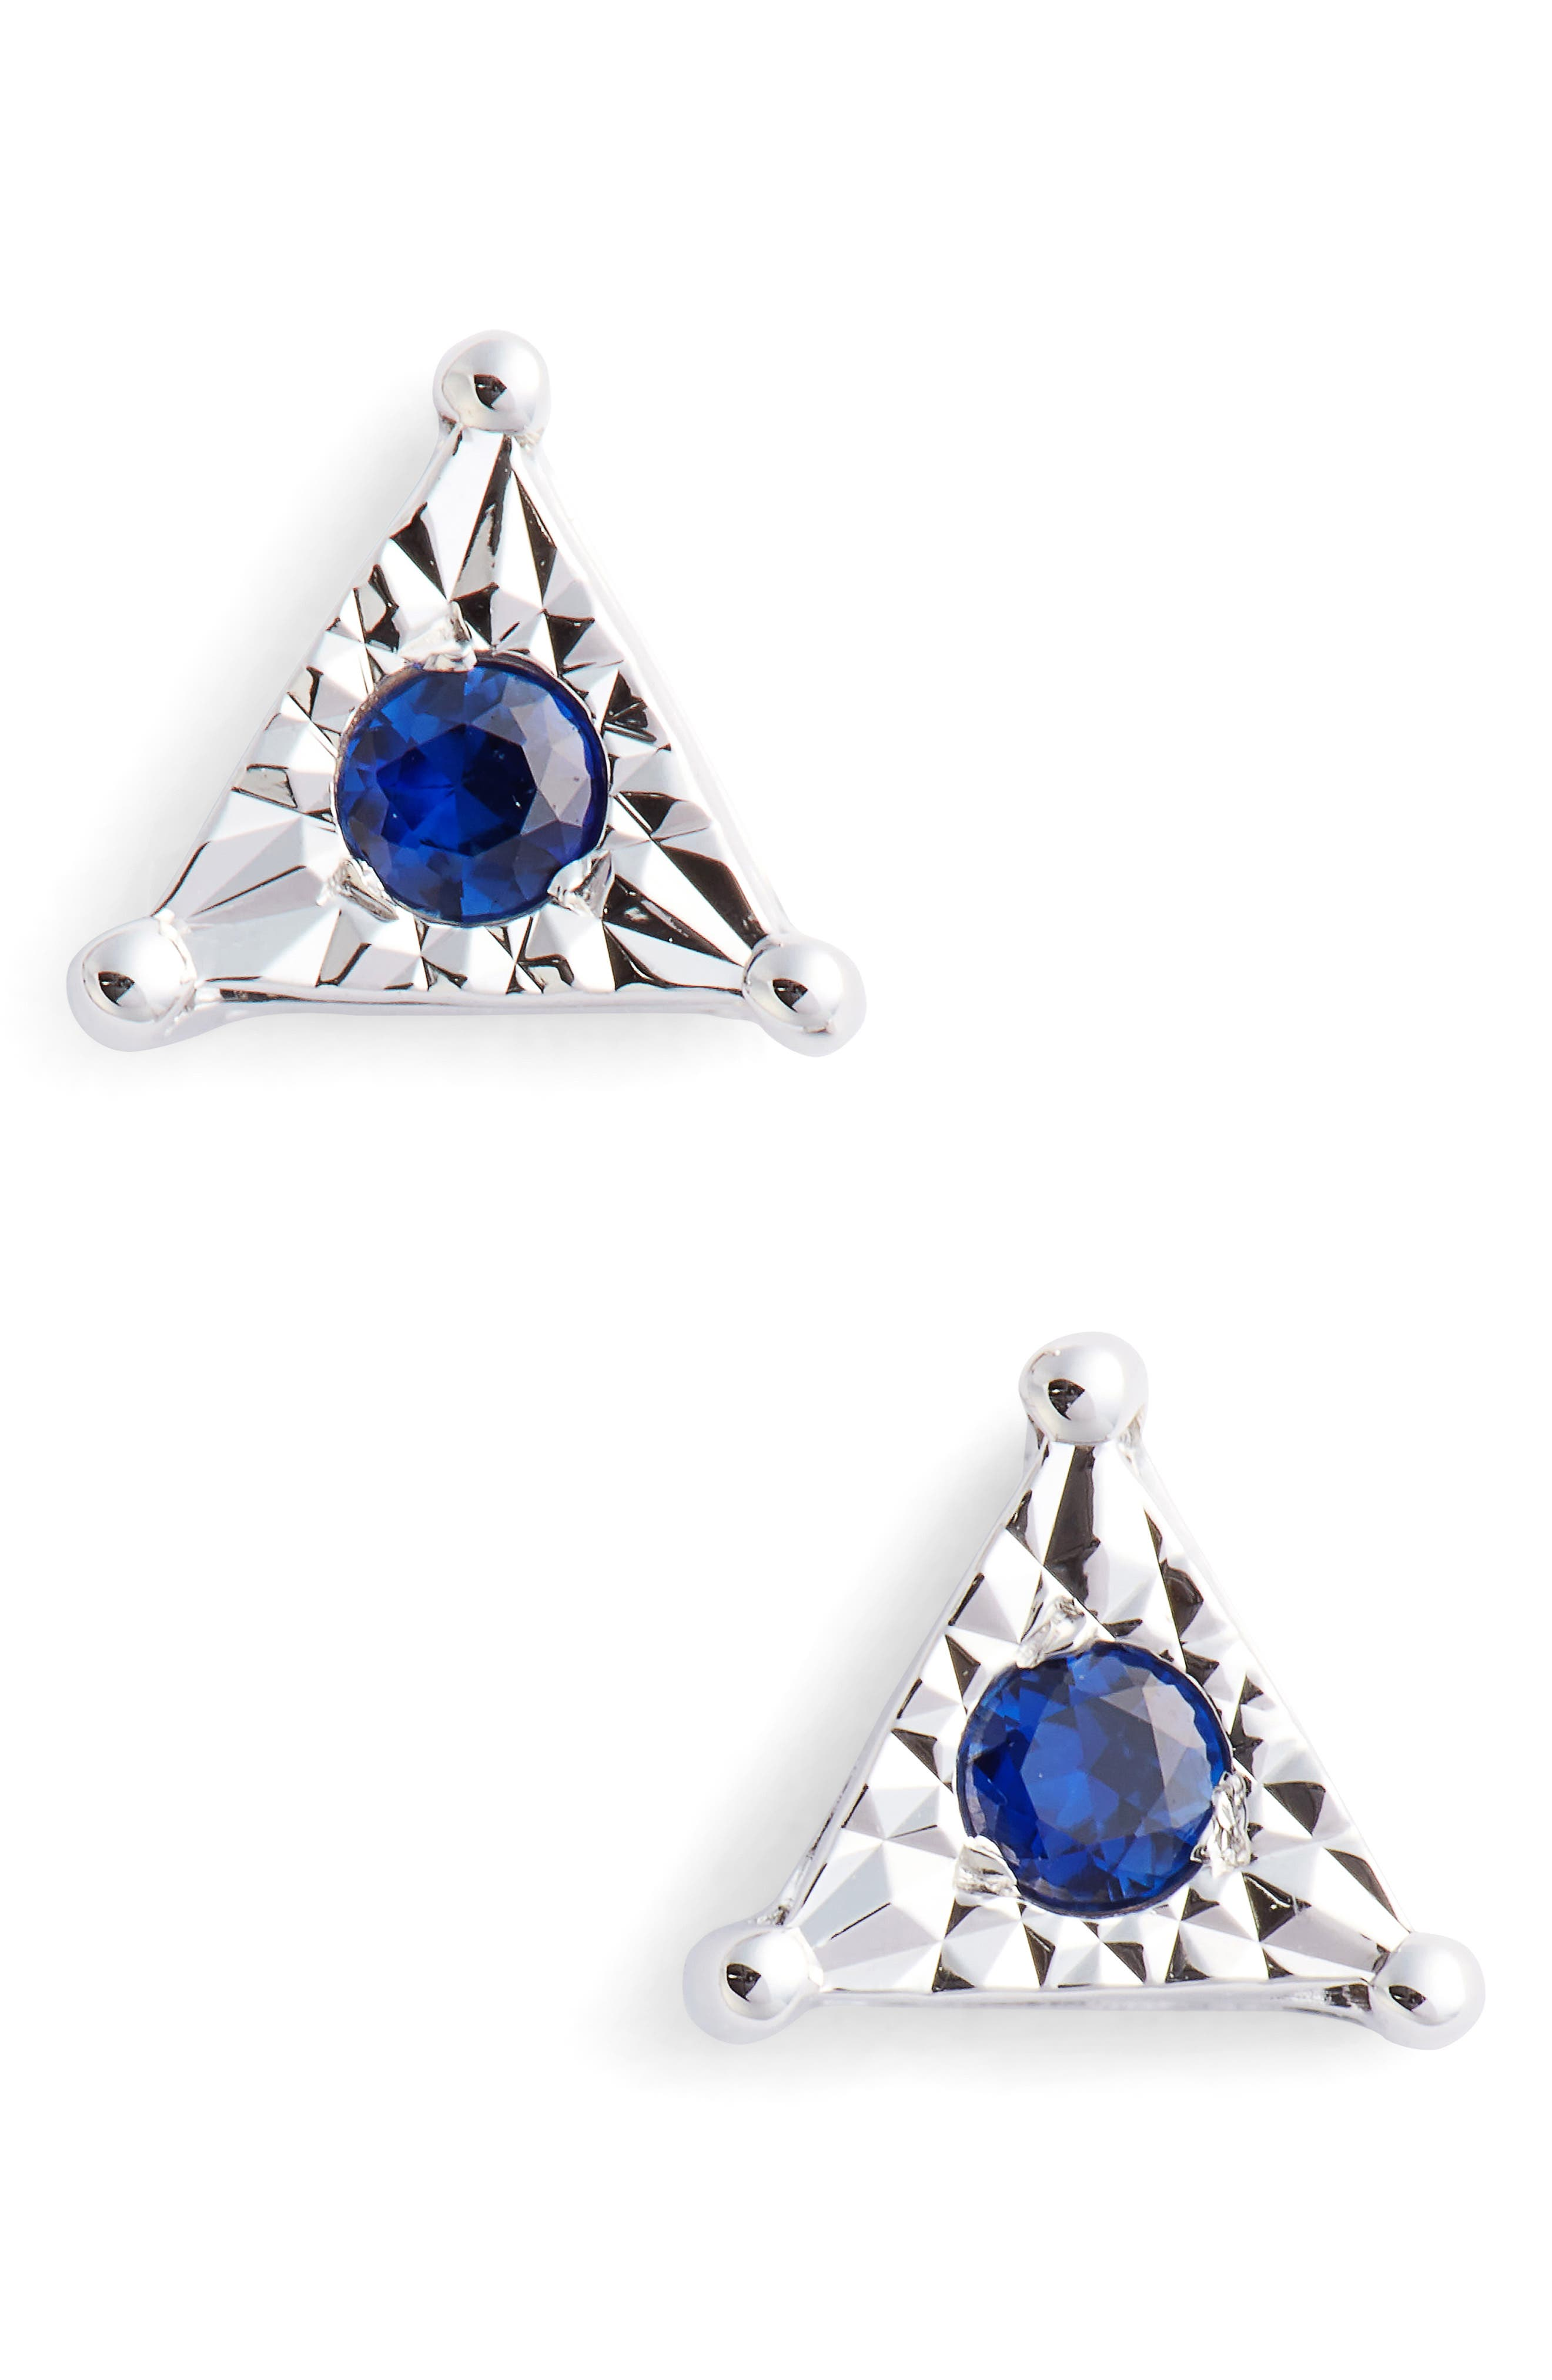 Emily Sarah Triangle Stud Earrings,                             Main thumbnail 1, color,                             WHITE GOLD/ BLUE SAPPHIRE